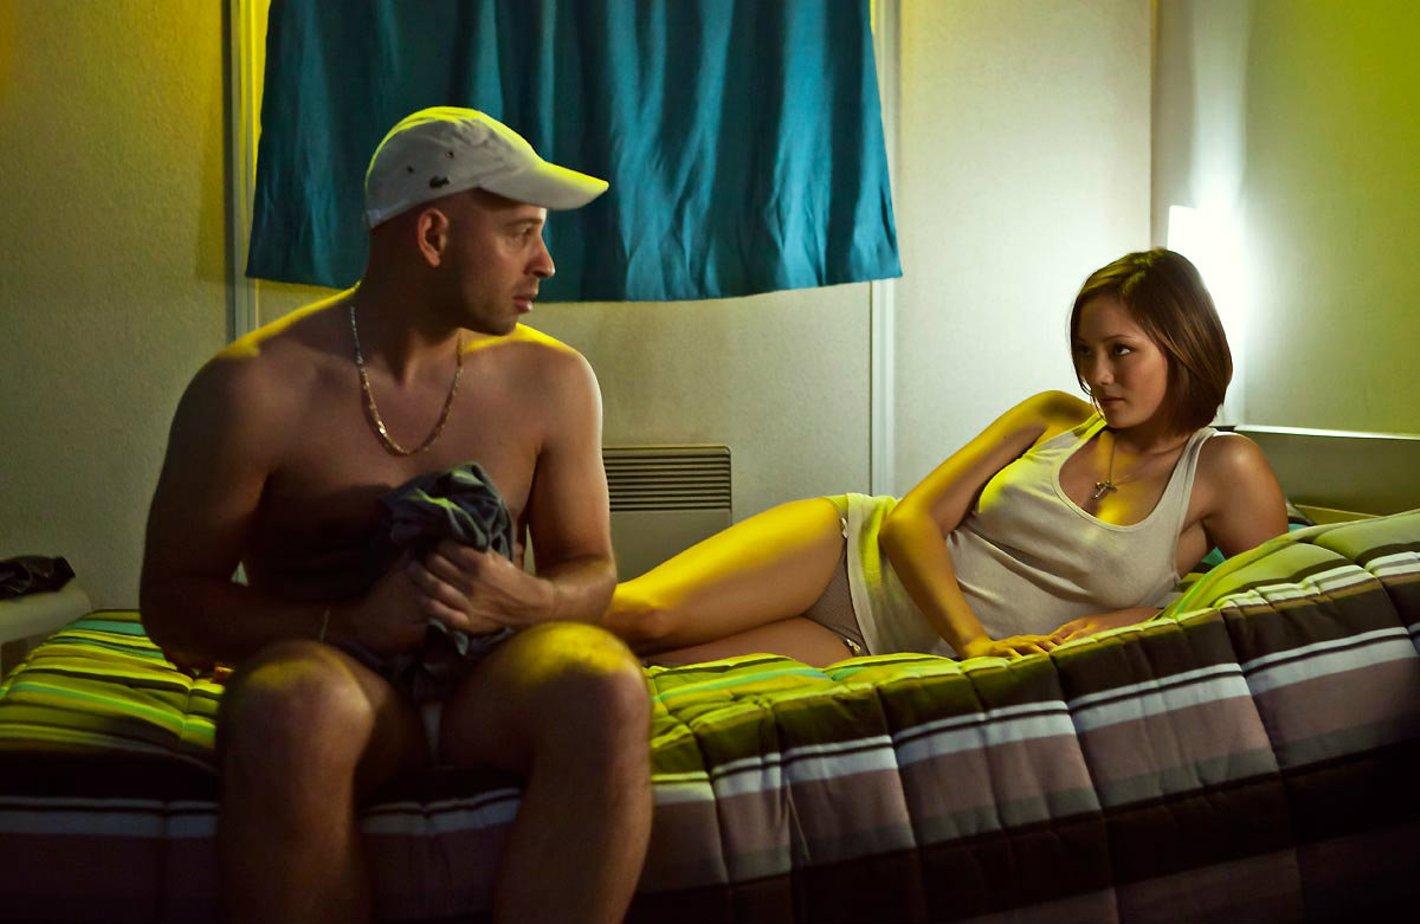 Sexiest girl in bluff fukking erotica movies